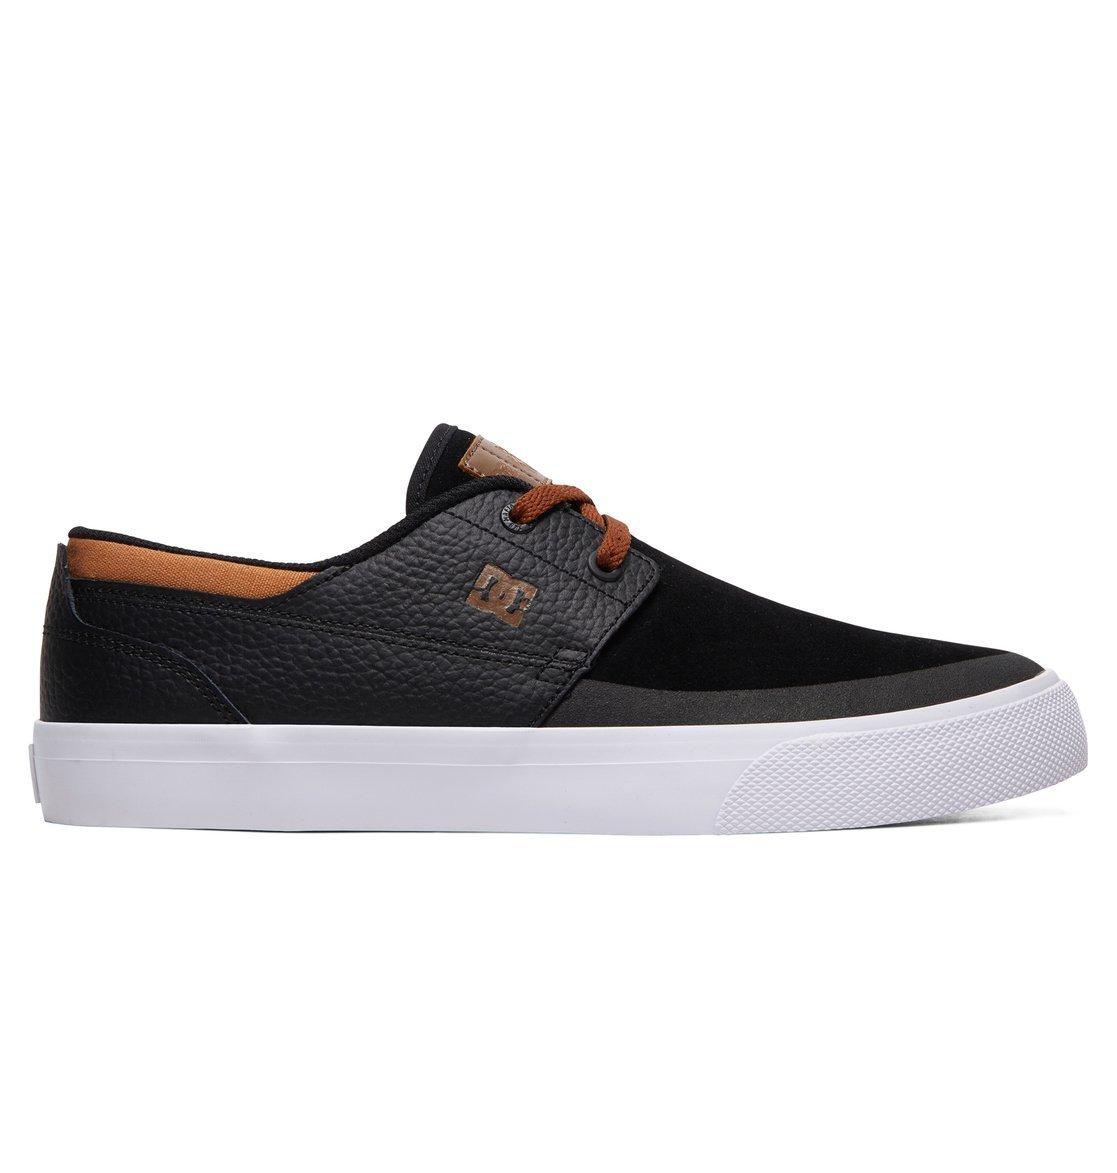 Кеды DC Shoes WES KREMER 2 S M SHOE XKKC BLACK/BLACK/BROWN